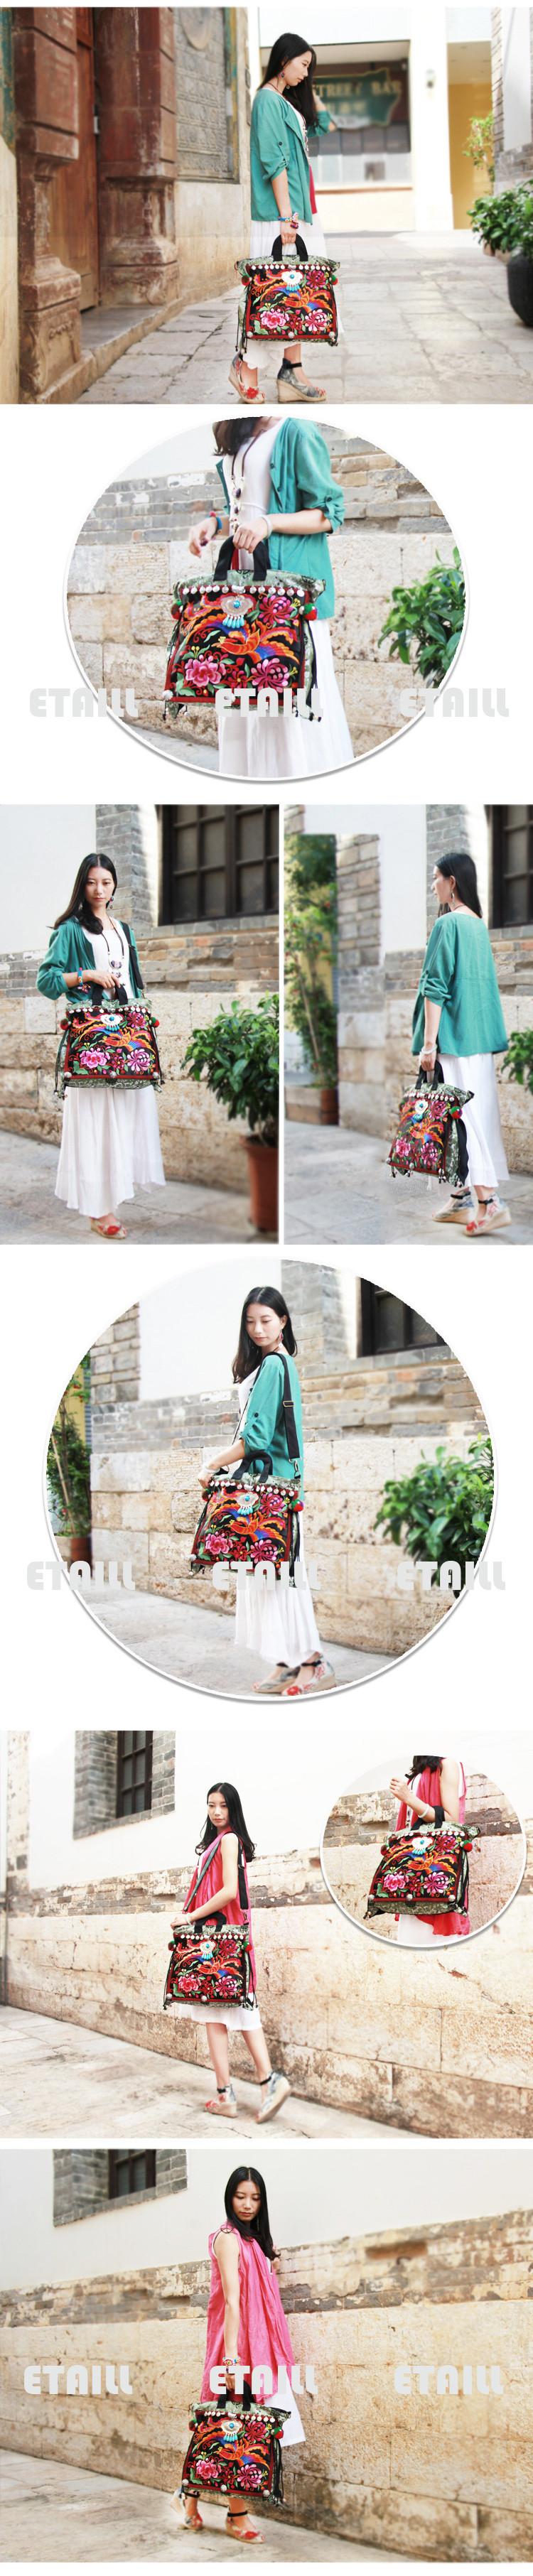 Chinese Style Cotton Handbag Embroidery Ethnic